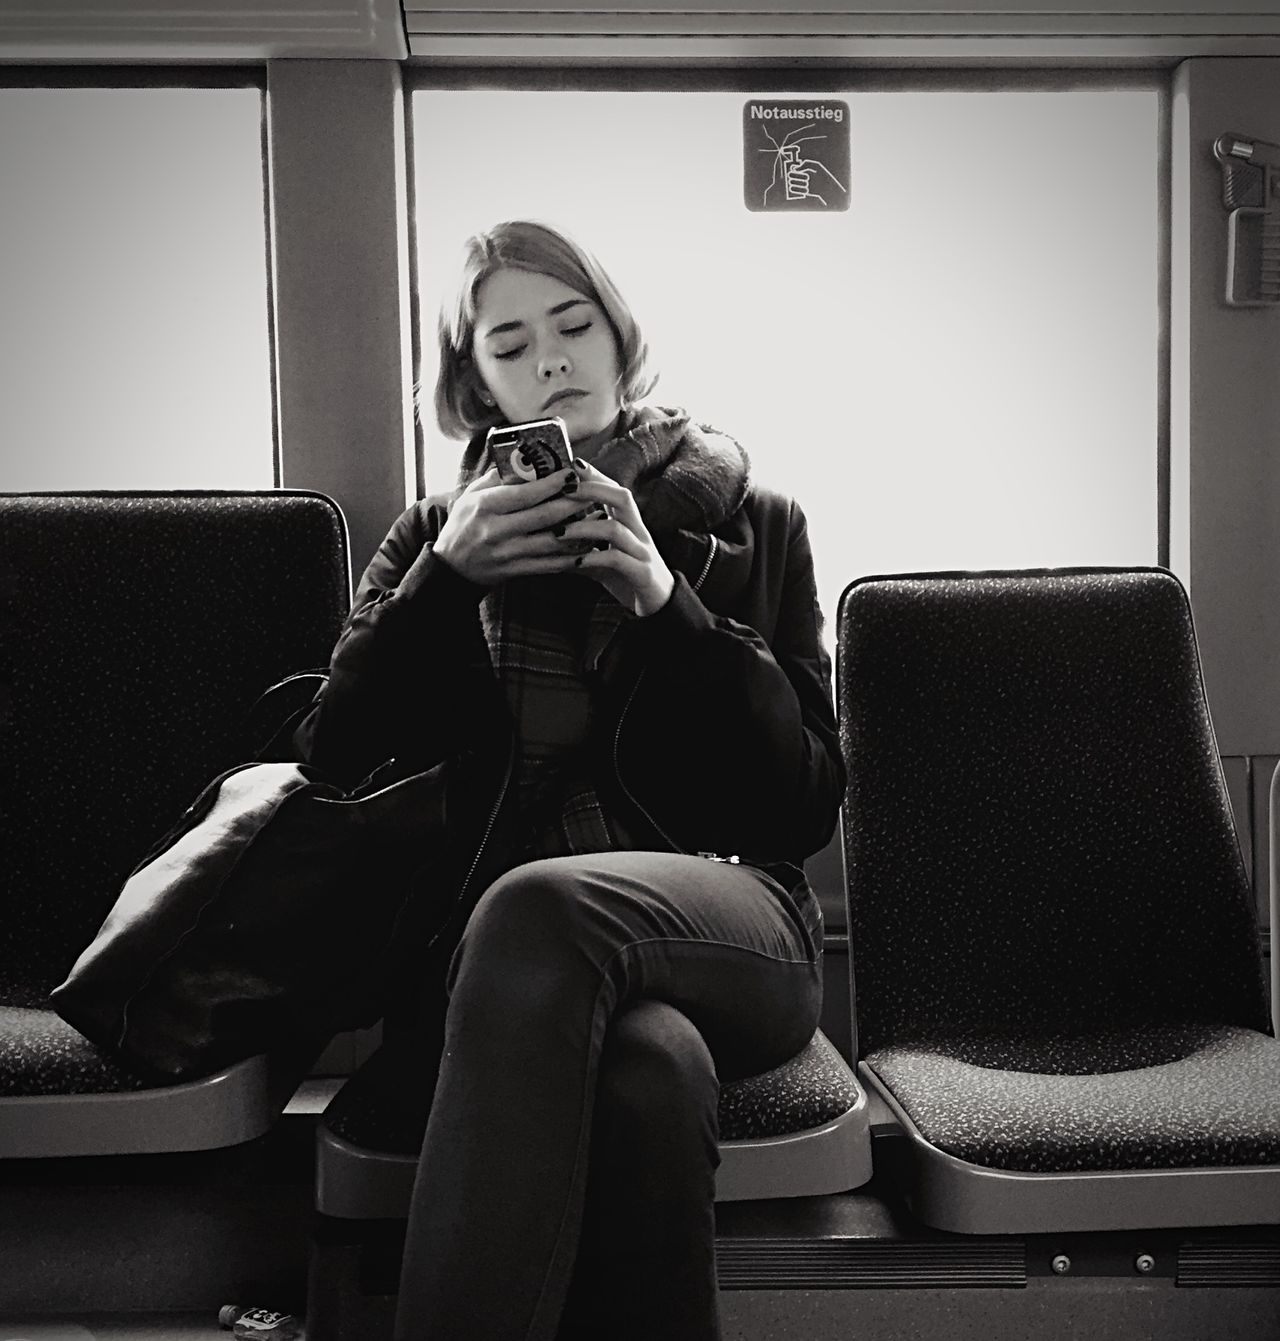 Streetphotography Portrait Mpro Blackandwhite Open Edit Berlin Mobilephotography.de The Street Photographer - 2015 EyeEm Awards Shades Of Grey